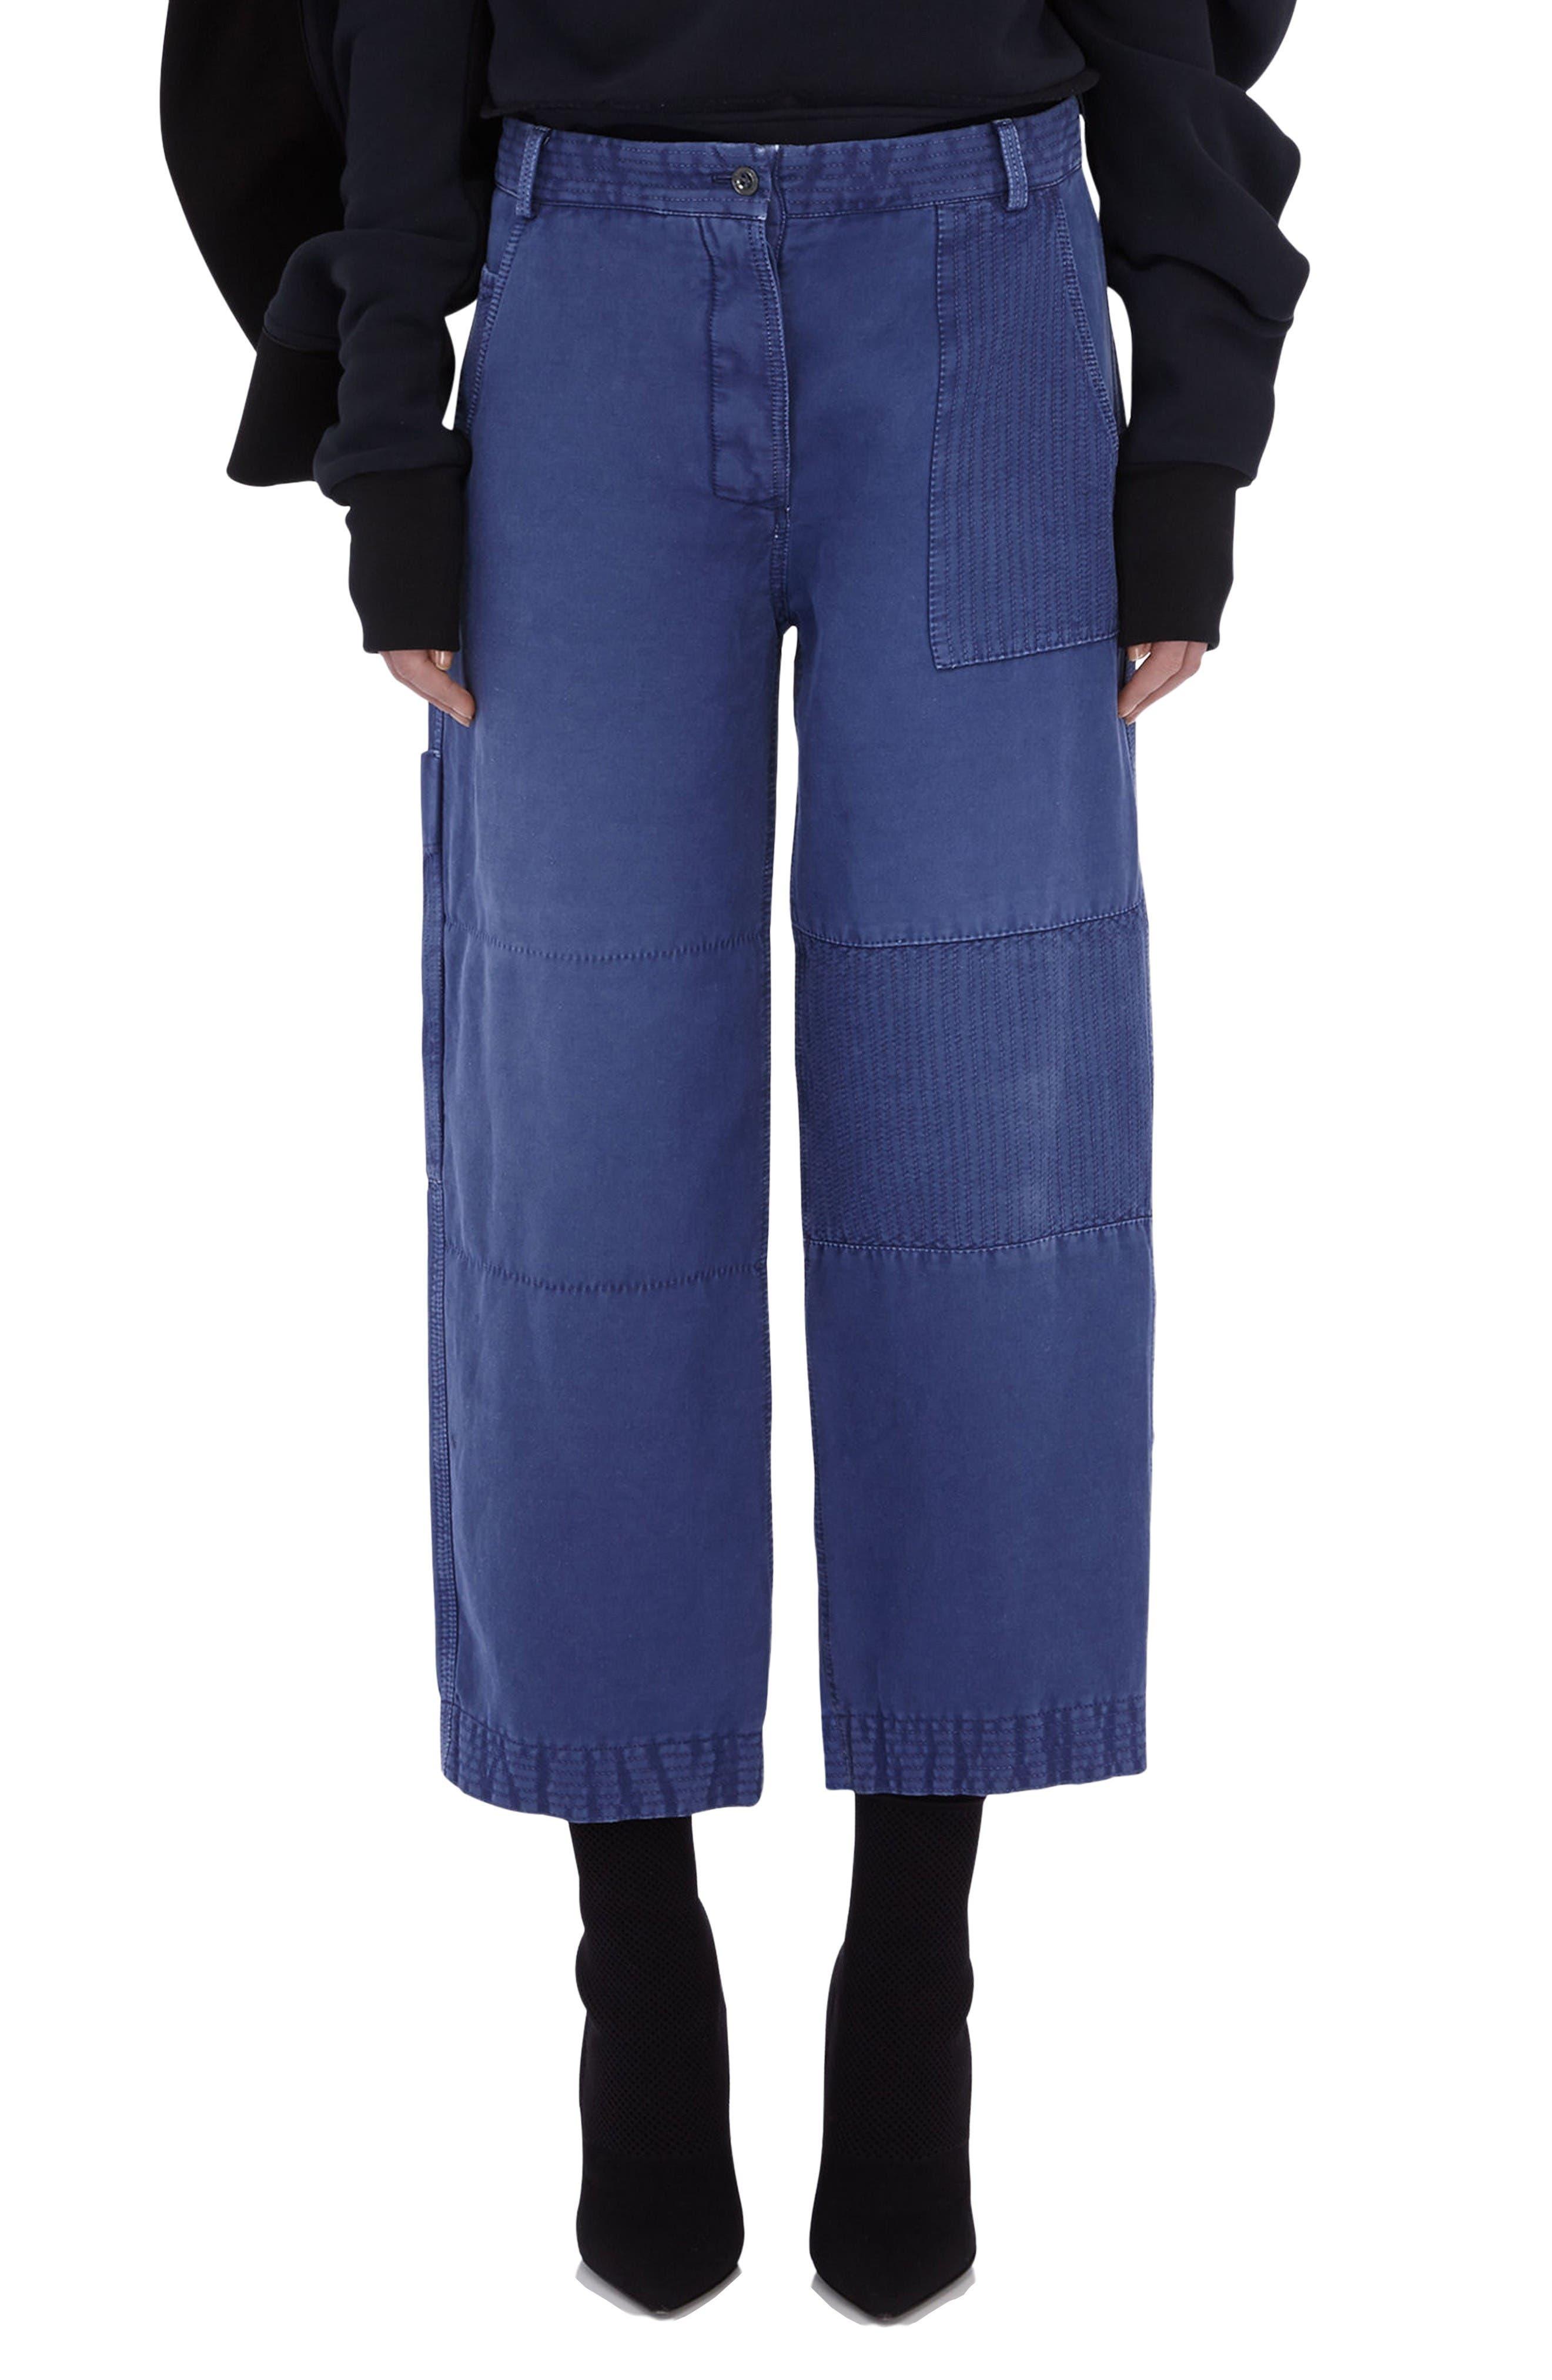 Burberry Crop Workwear Pants